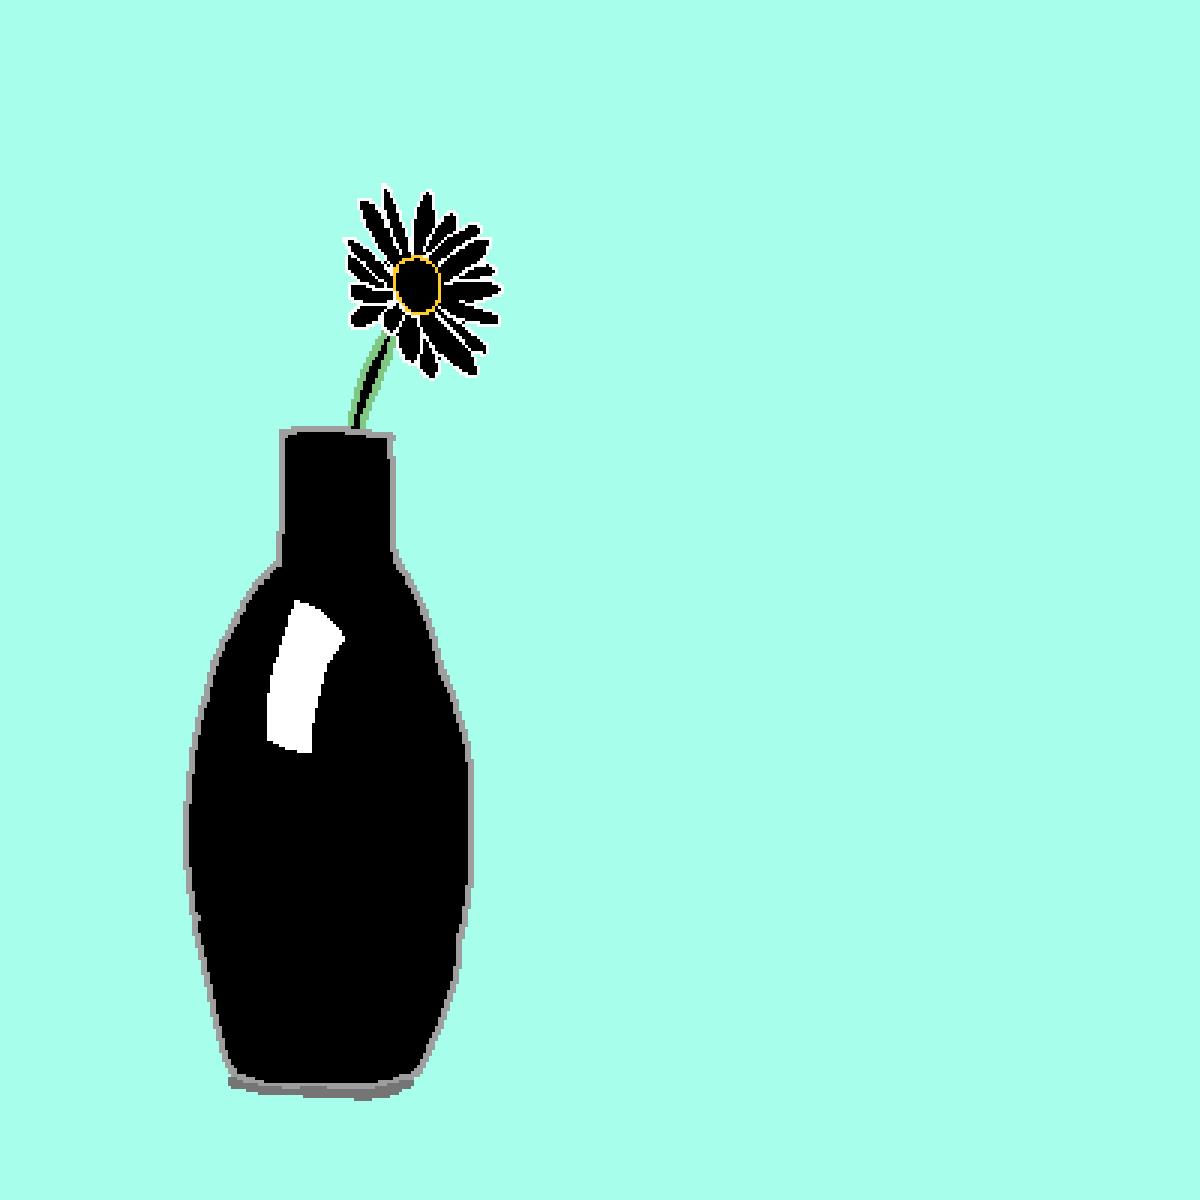 Flower Base by NoobsDotcom